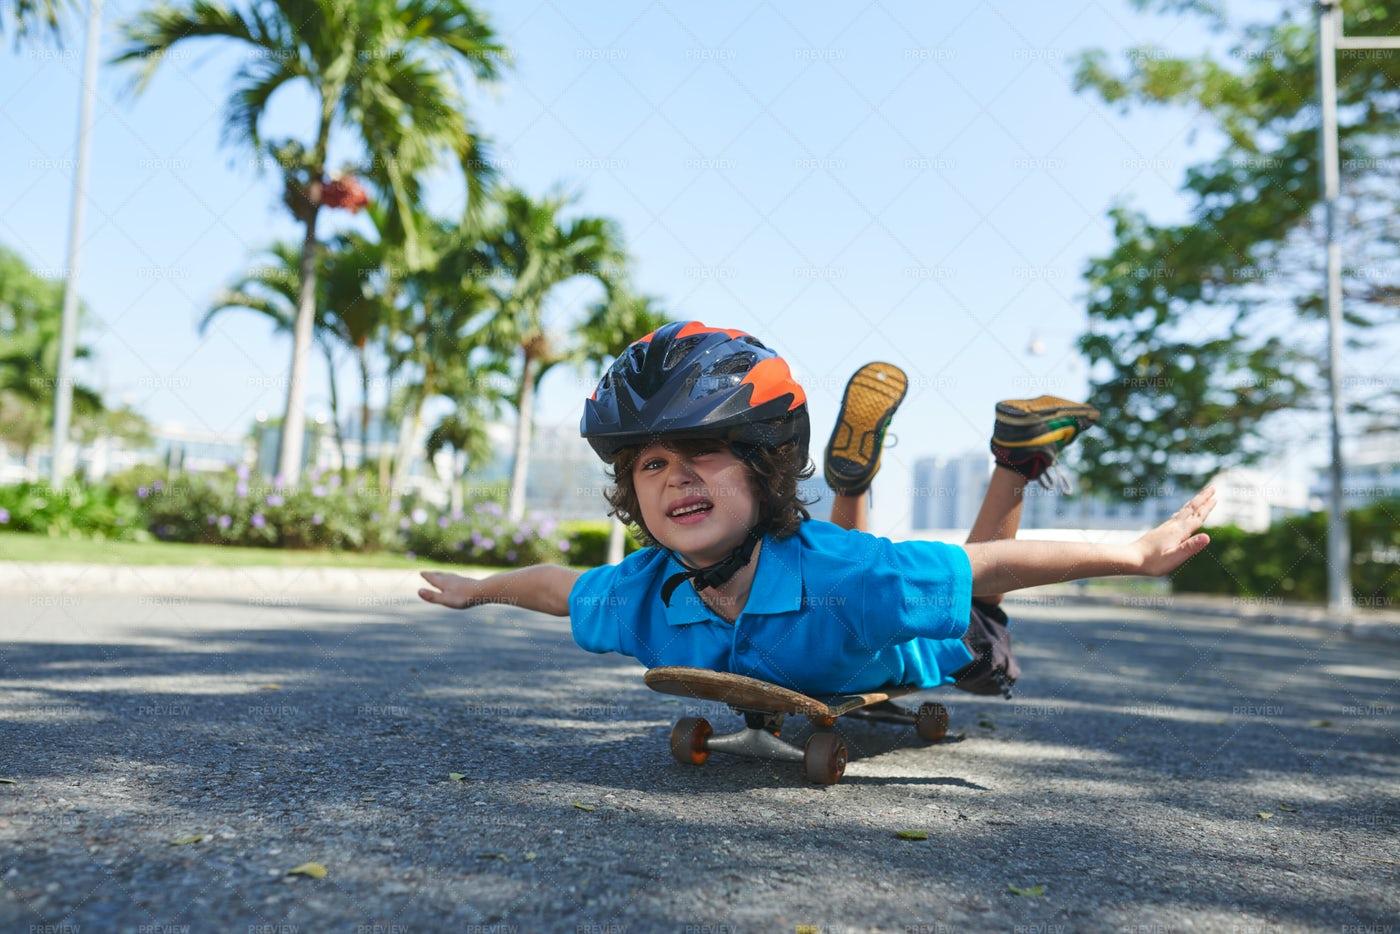 Funny Little Boy On Skateboard: Stock Photos